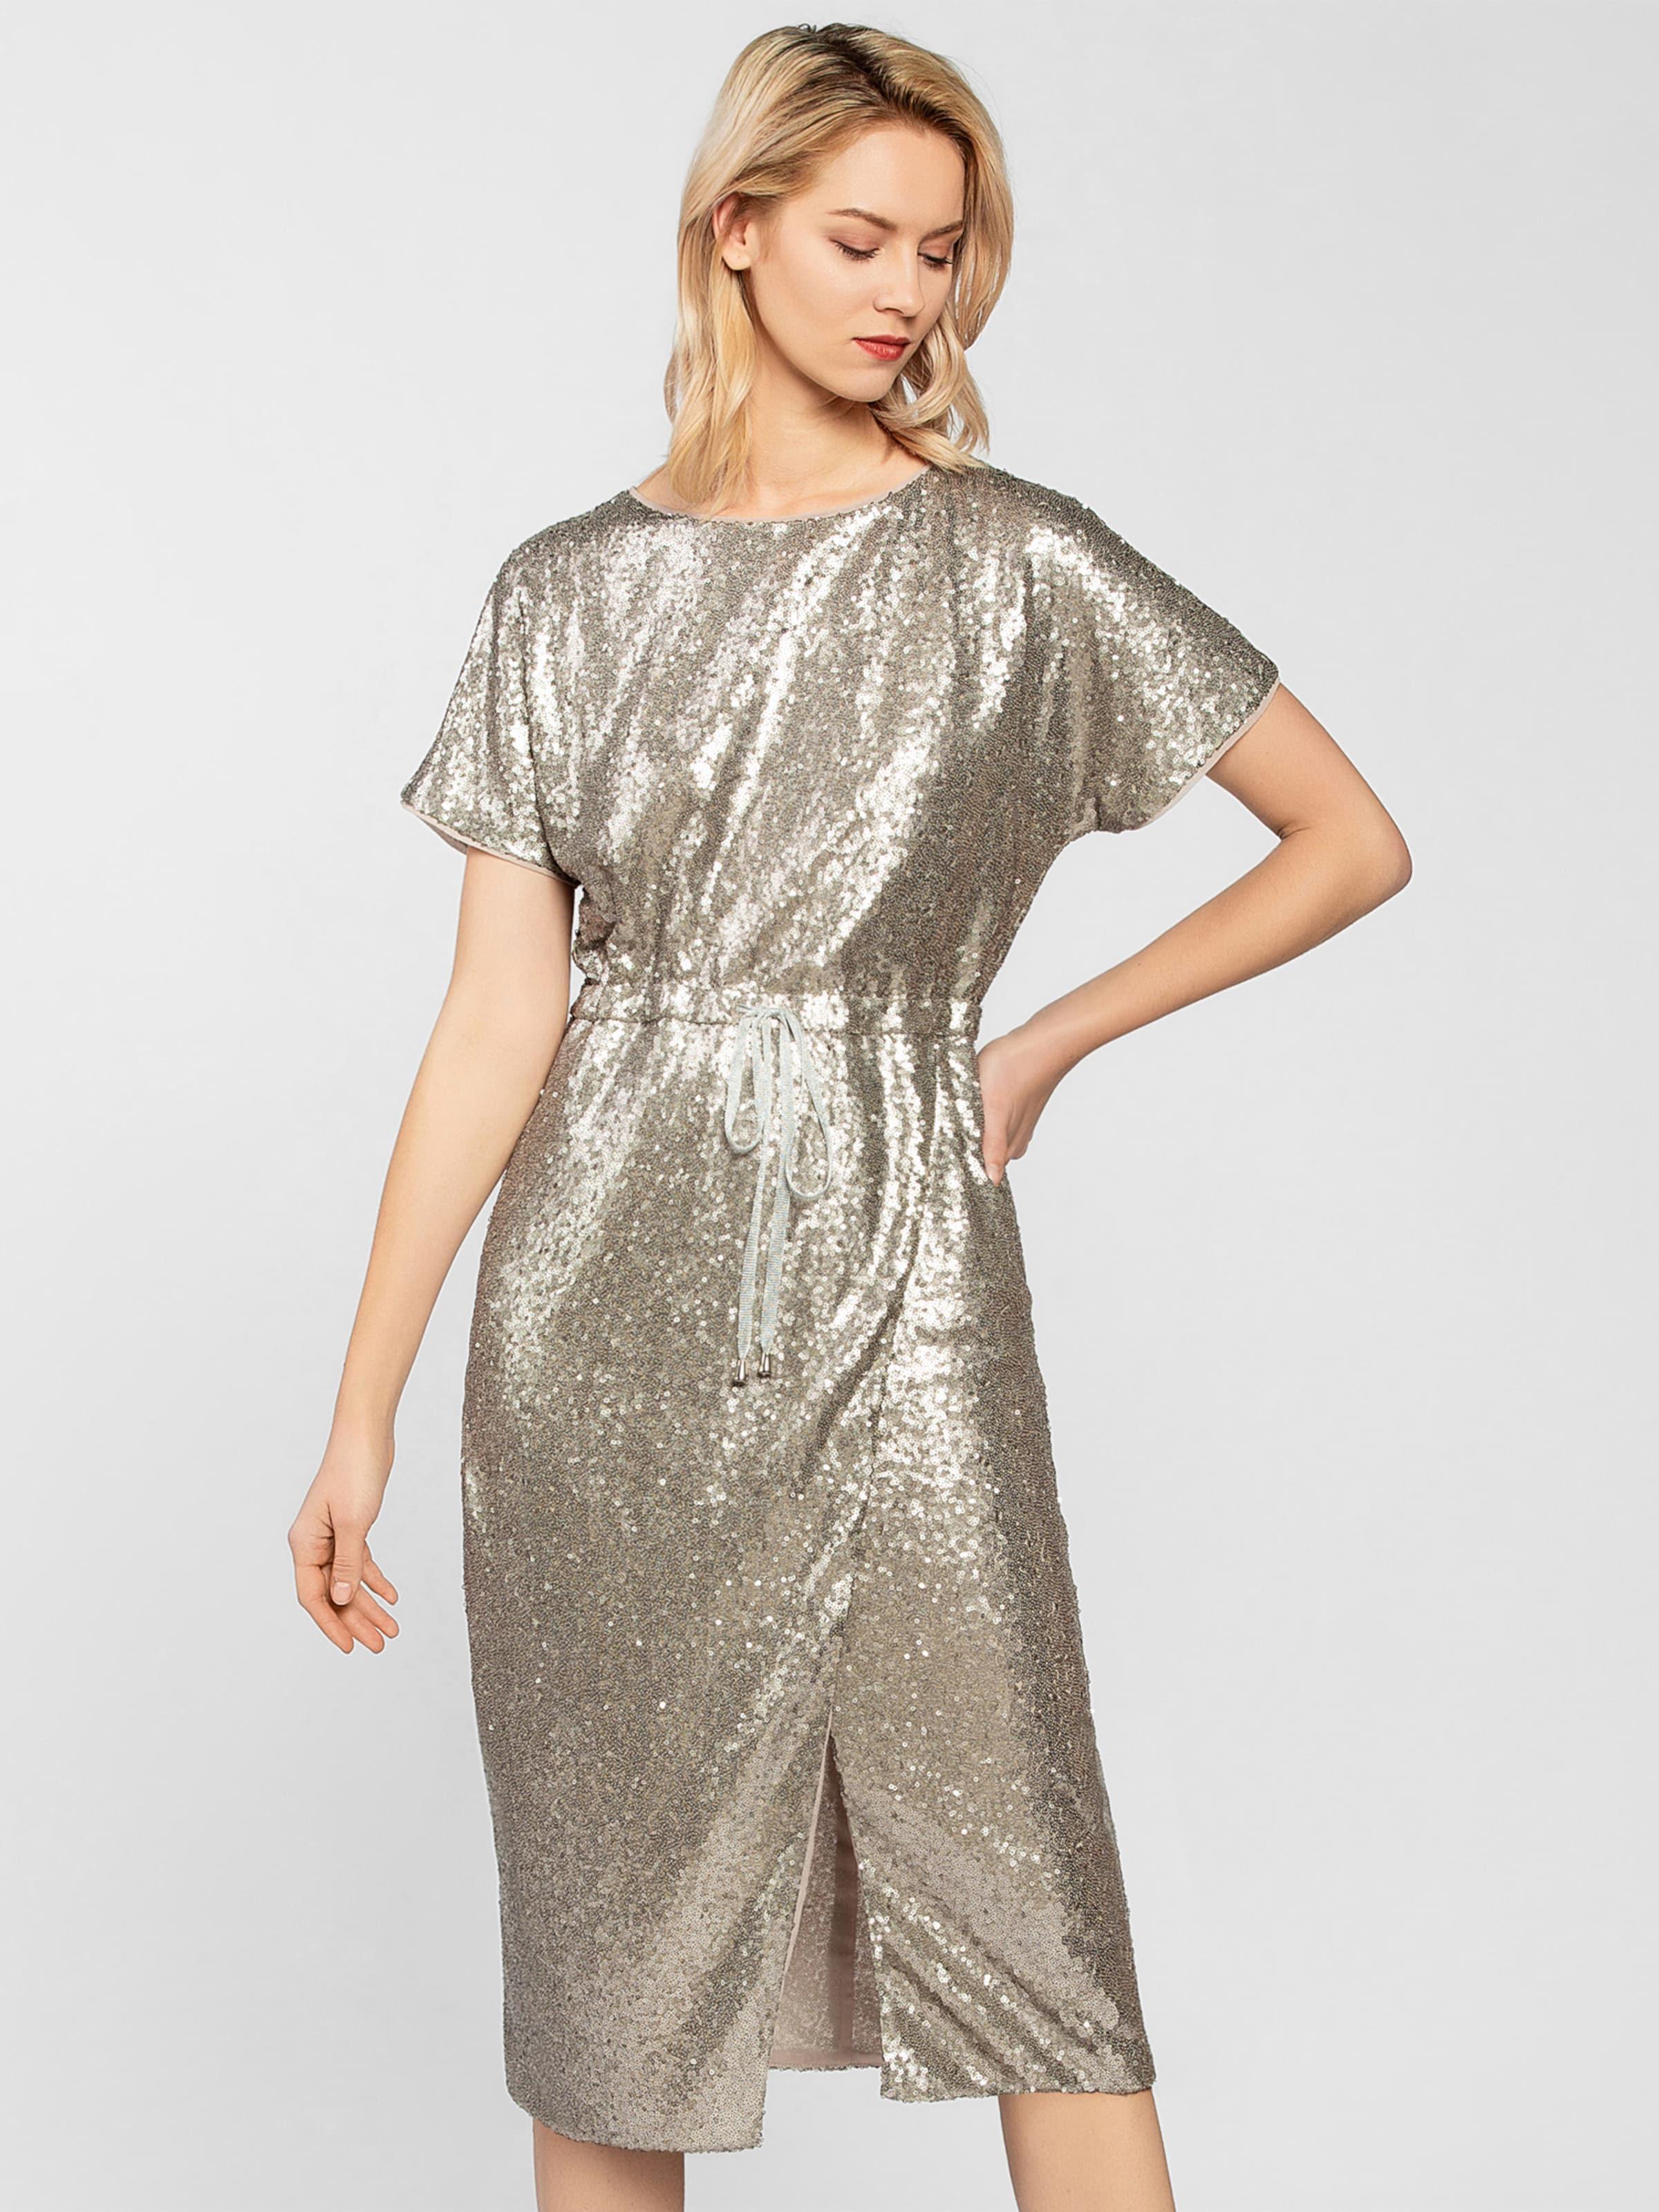 In Paillettenkleid In Silber Apart In Apart Silber Apart Silber Apart Paillettenkleid Paillettenkleid q5A3j4RL